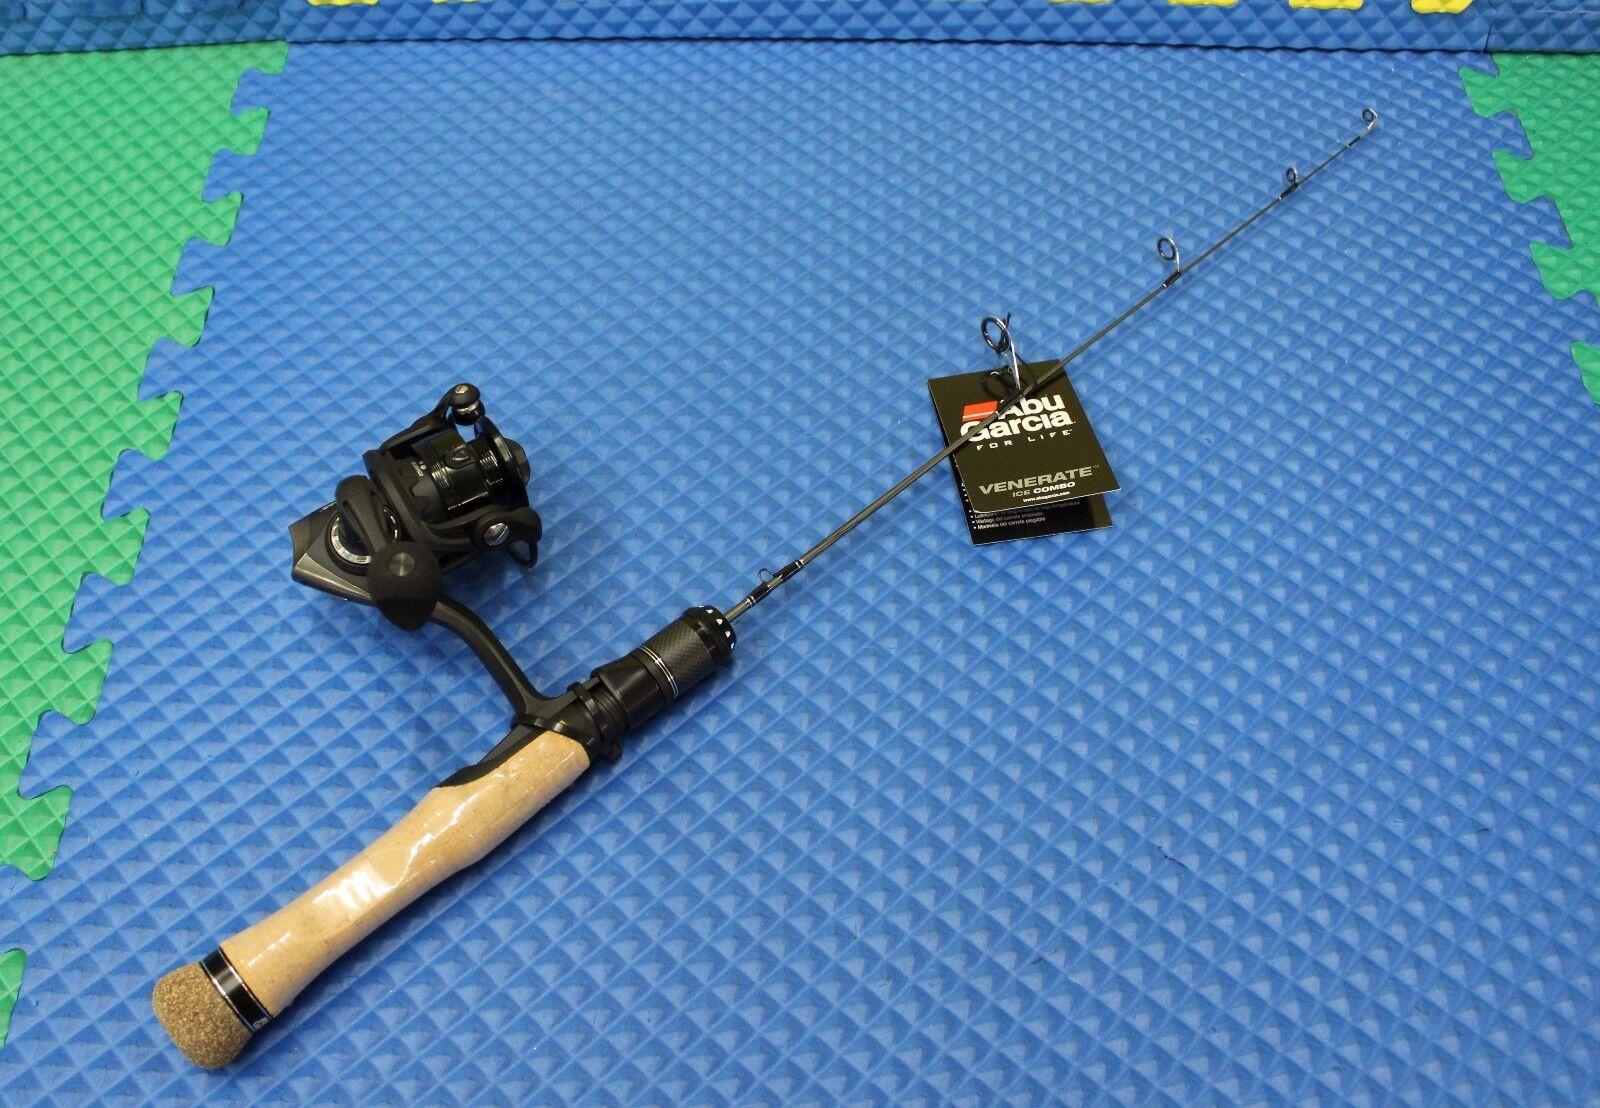 Abu Garcia Rod & Reel  Venerate Ice Fishing Combo AVNRTICE25LCBO 1424501  no hesitation!buy now!